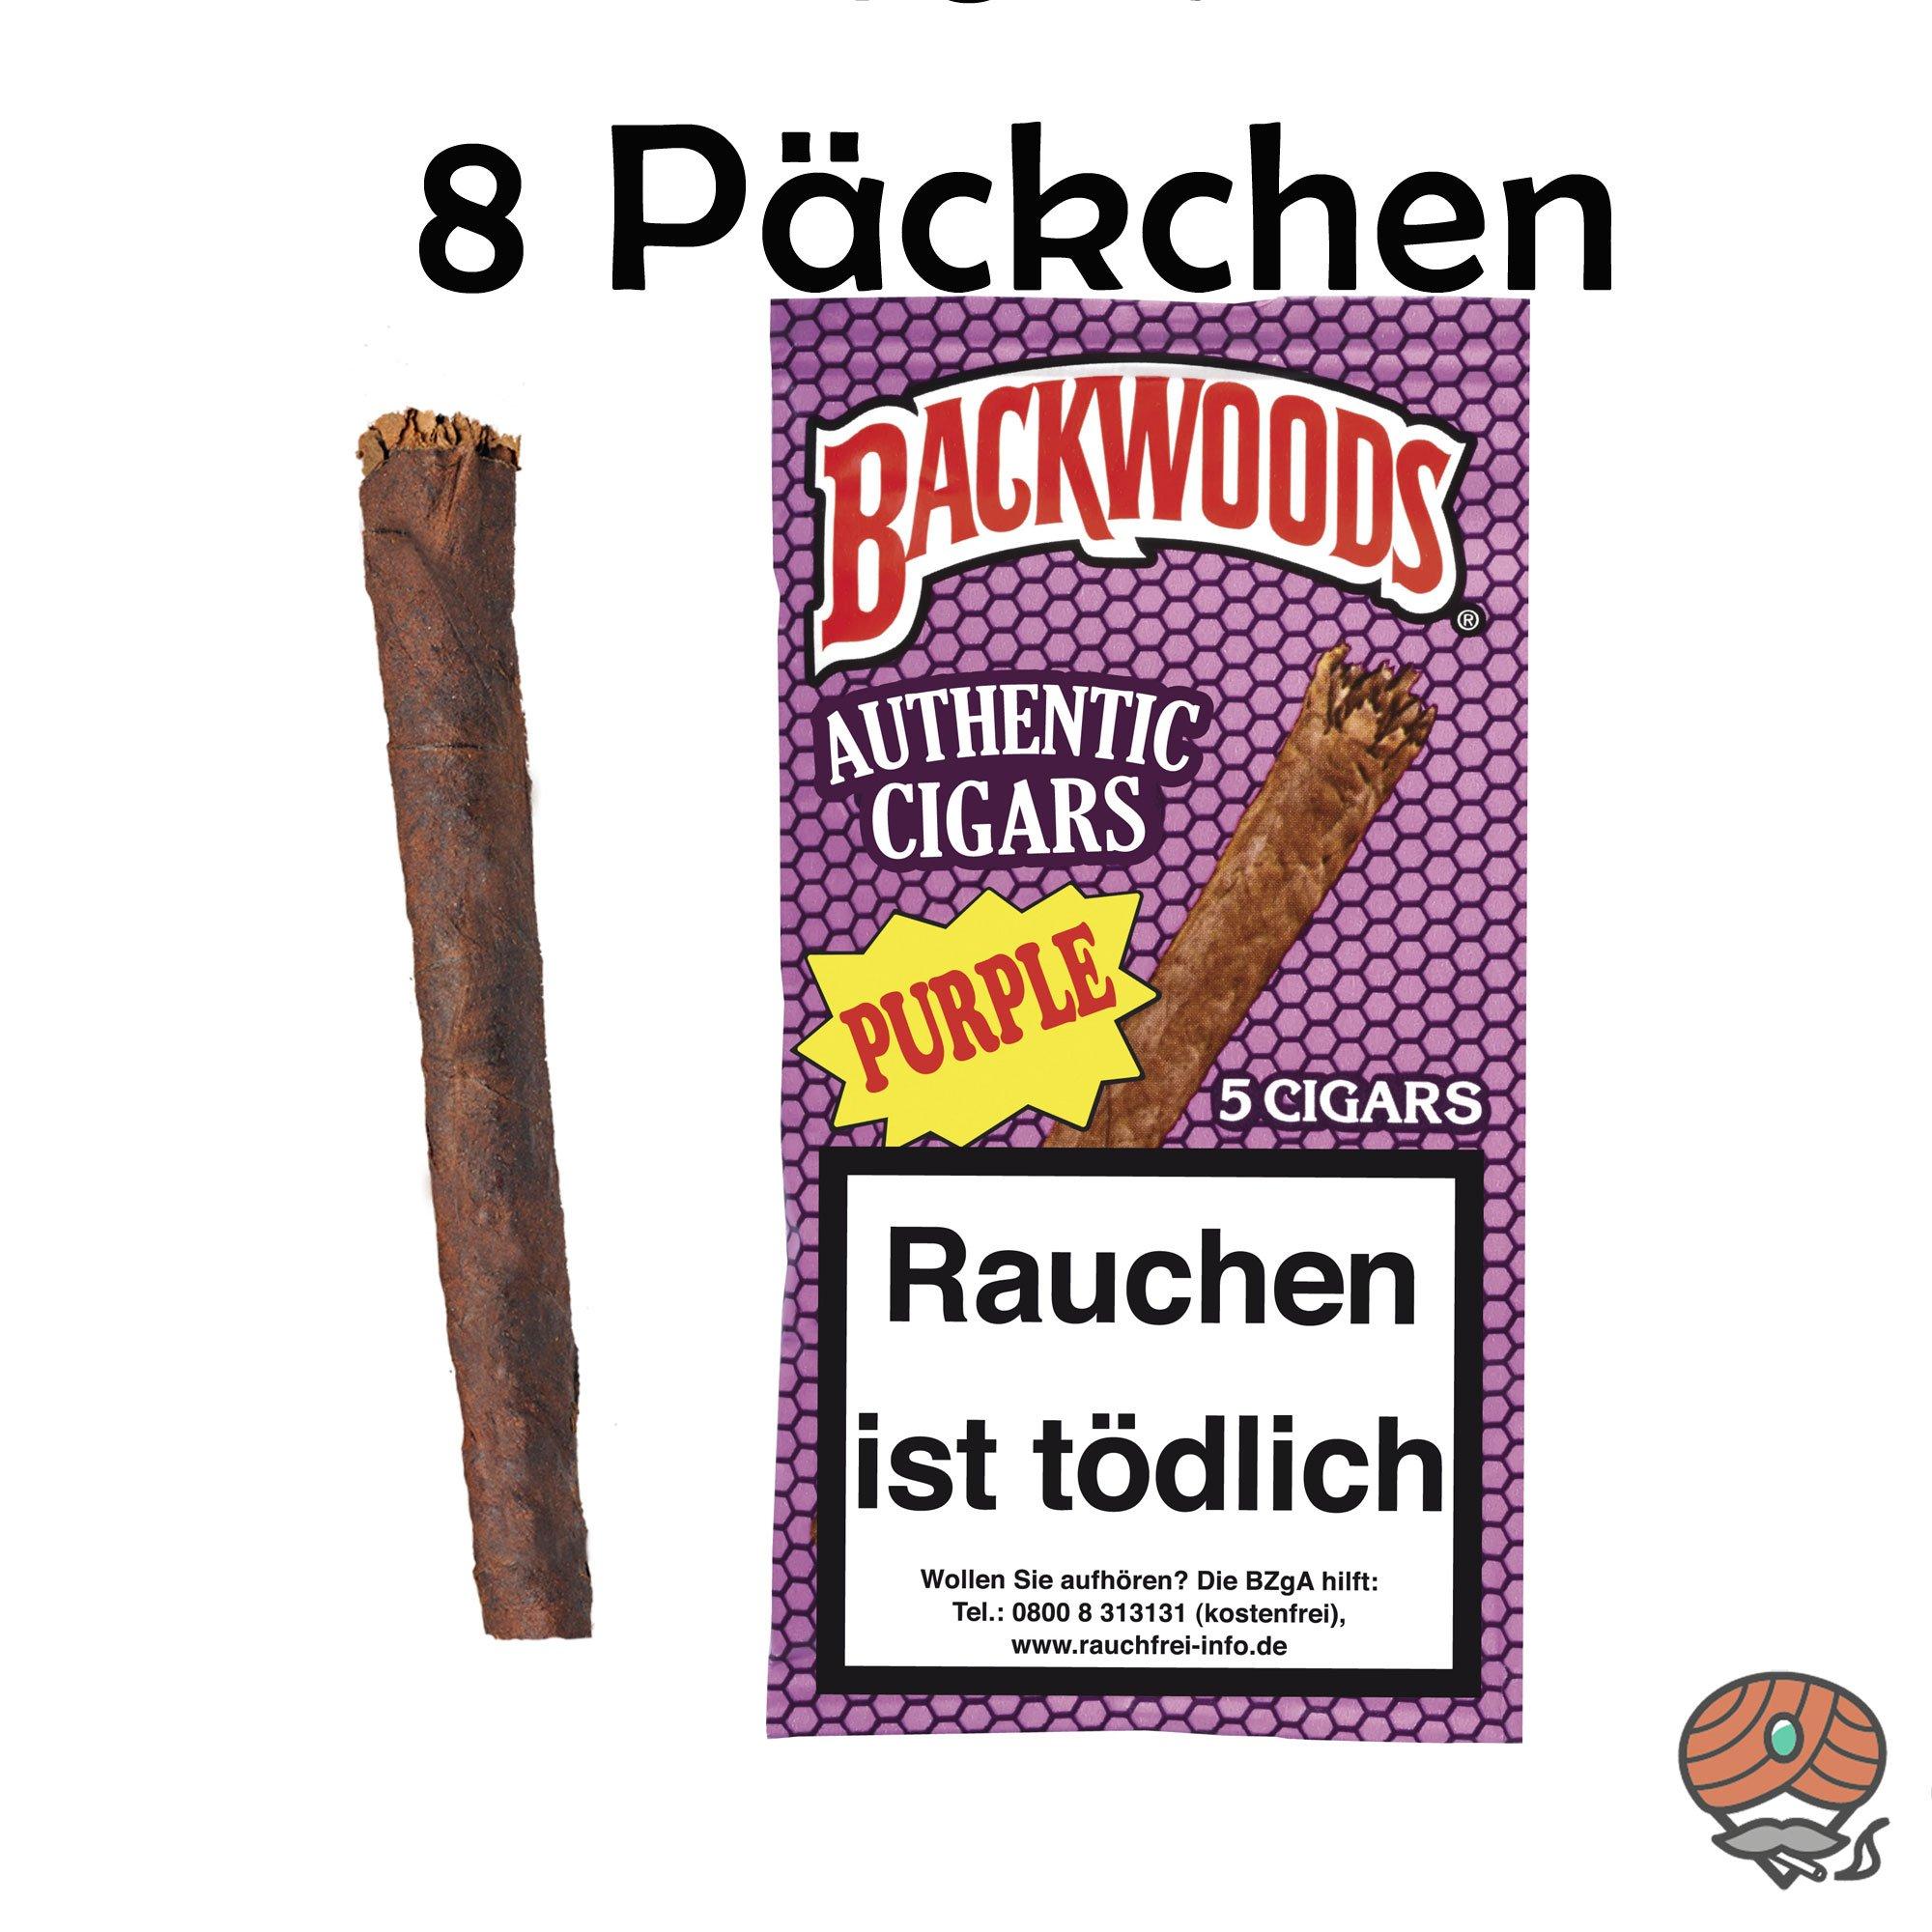 8x Backwoods Purple Authentic Cigars 5 Stück 100% Tabak im Humipack